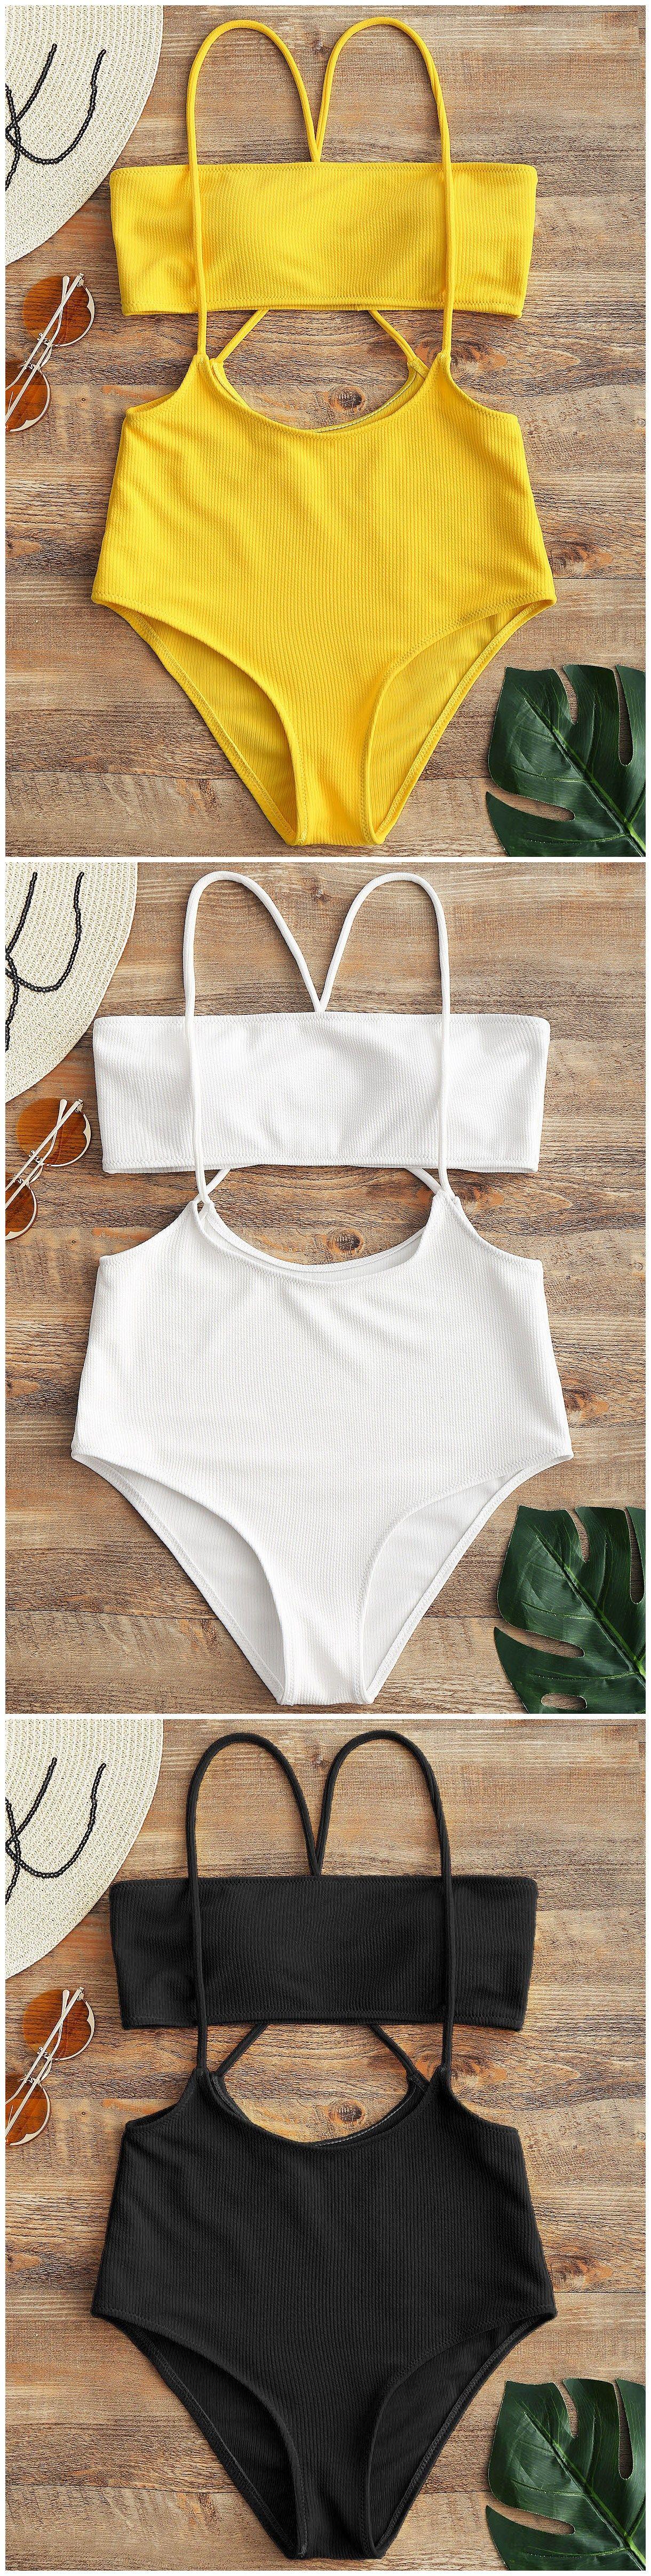 28409b5a15 Bandeau Top And High Waisted Slip Bikini Bottoms. #Zaful #Swimwear #Bikinis  zaful,zaful outfits,zaful dresses,spring outfits,summer dresses,Valentine's  Day ...